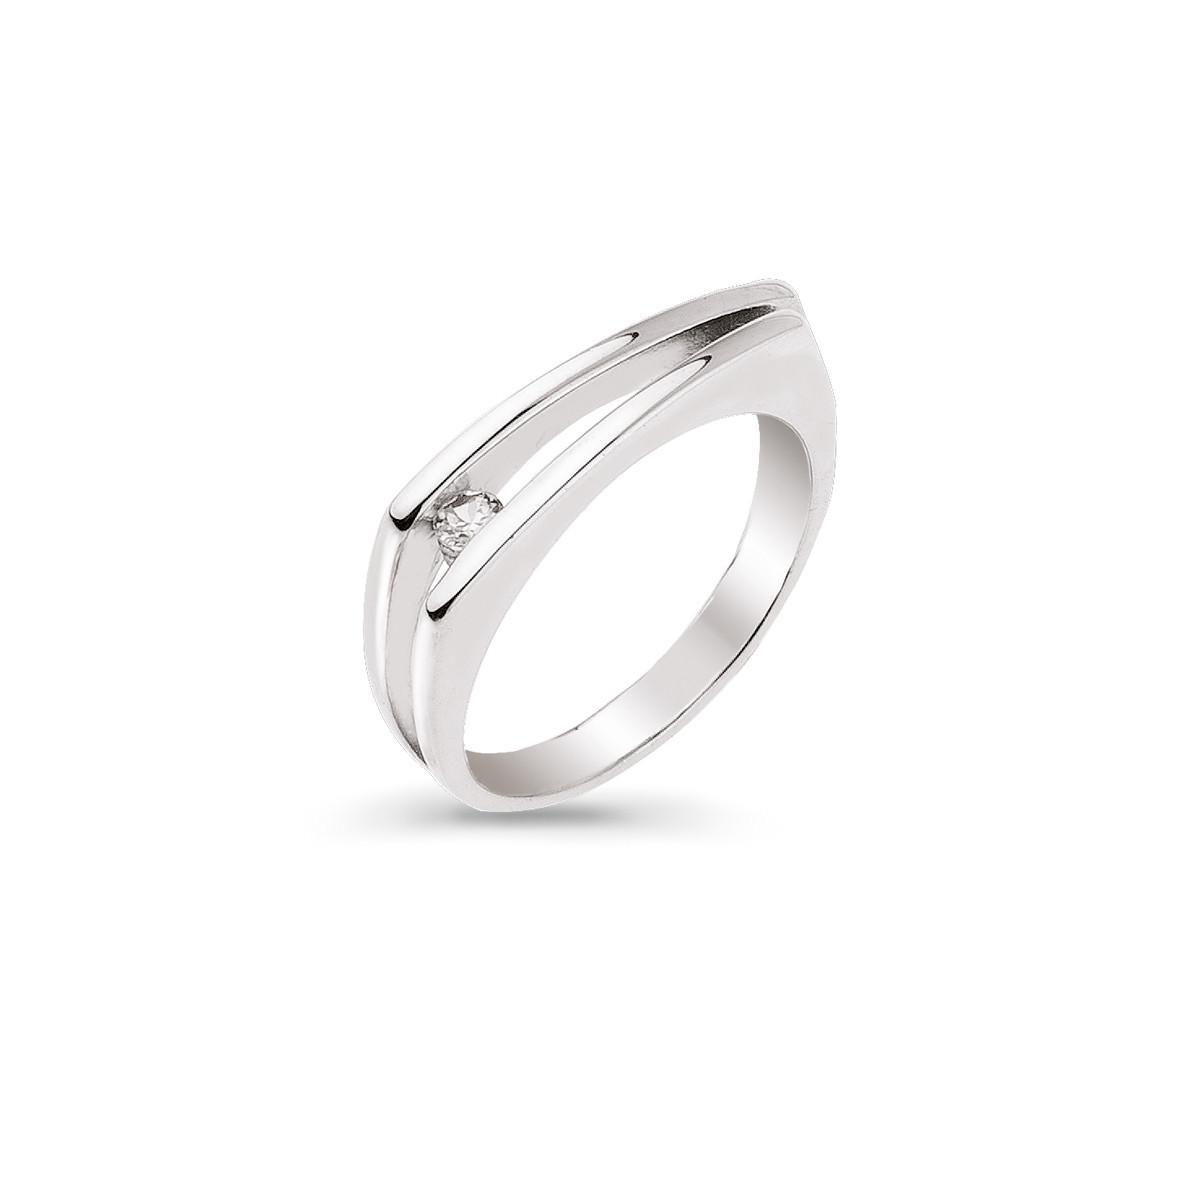 Pierścionek srebrny, rozmiar: 11, Kruk, model: SAR/PS04